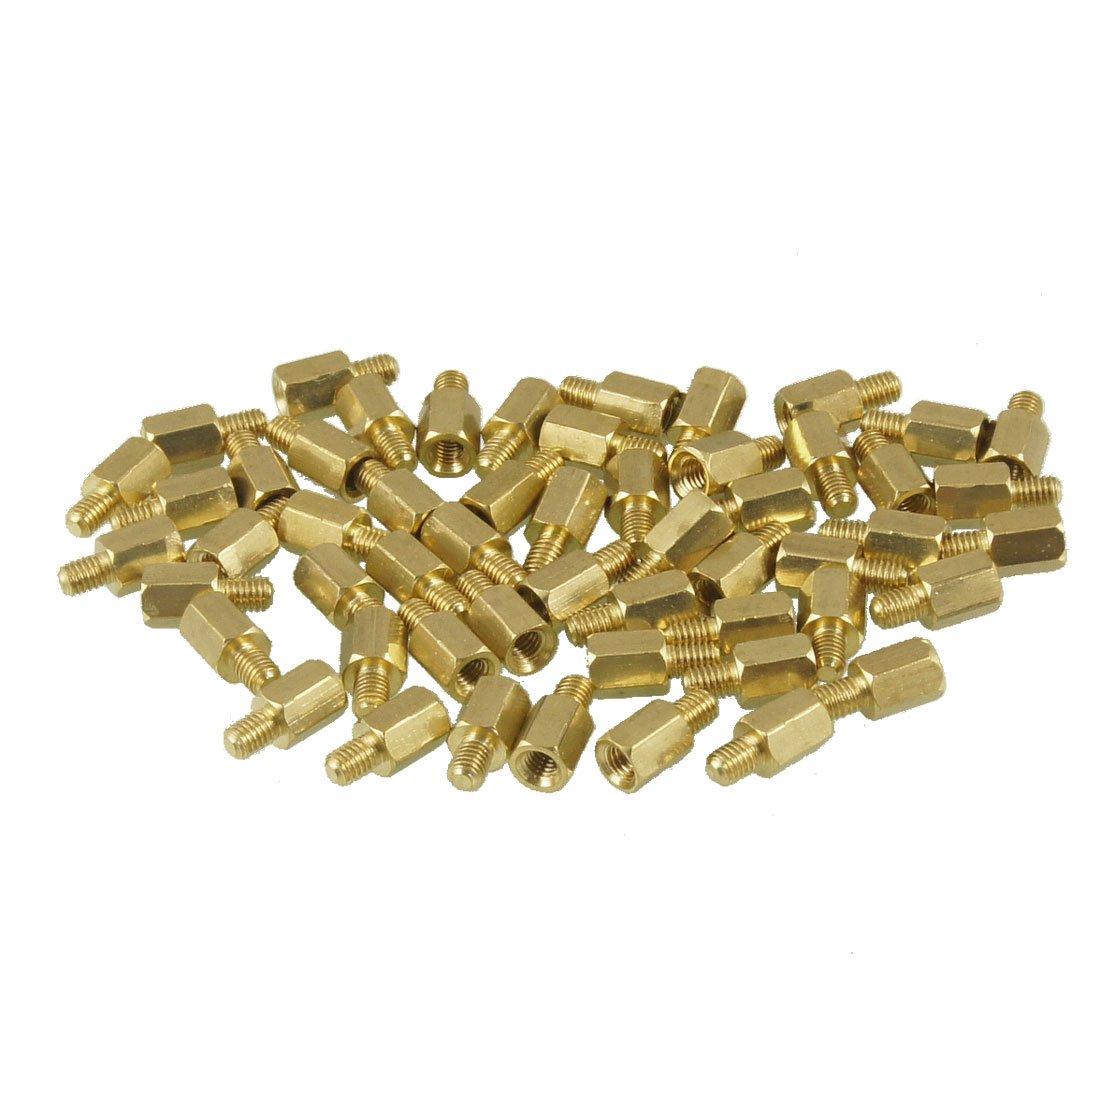 50 Pieces M3 Male x M3 Female 6mm Body Threaded